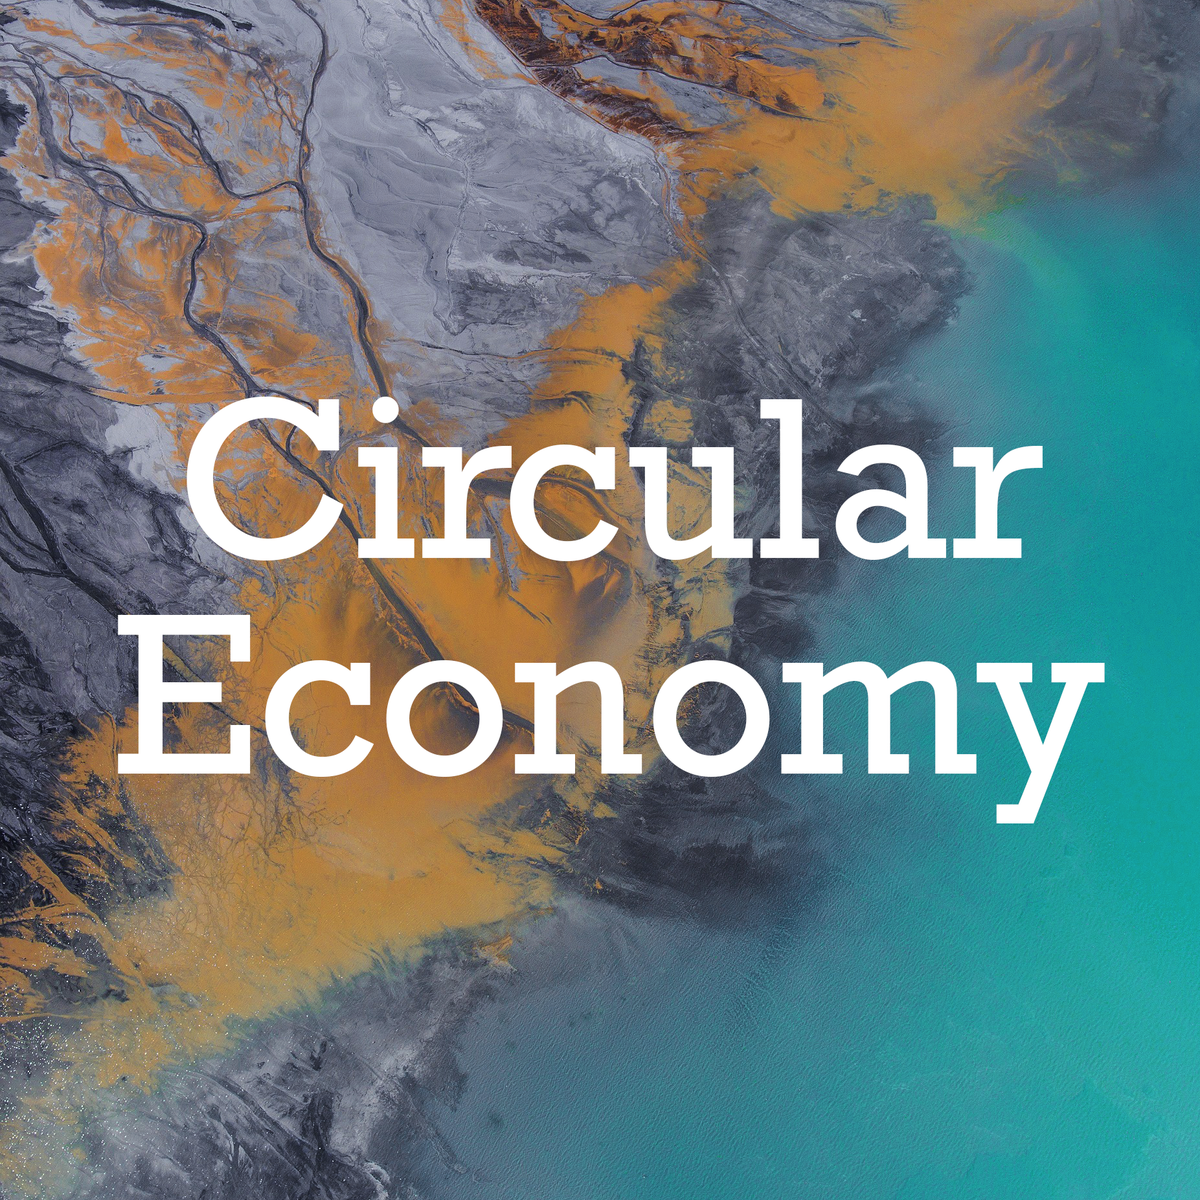 Circular Economy - Sustainable Materials Management